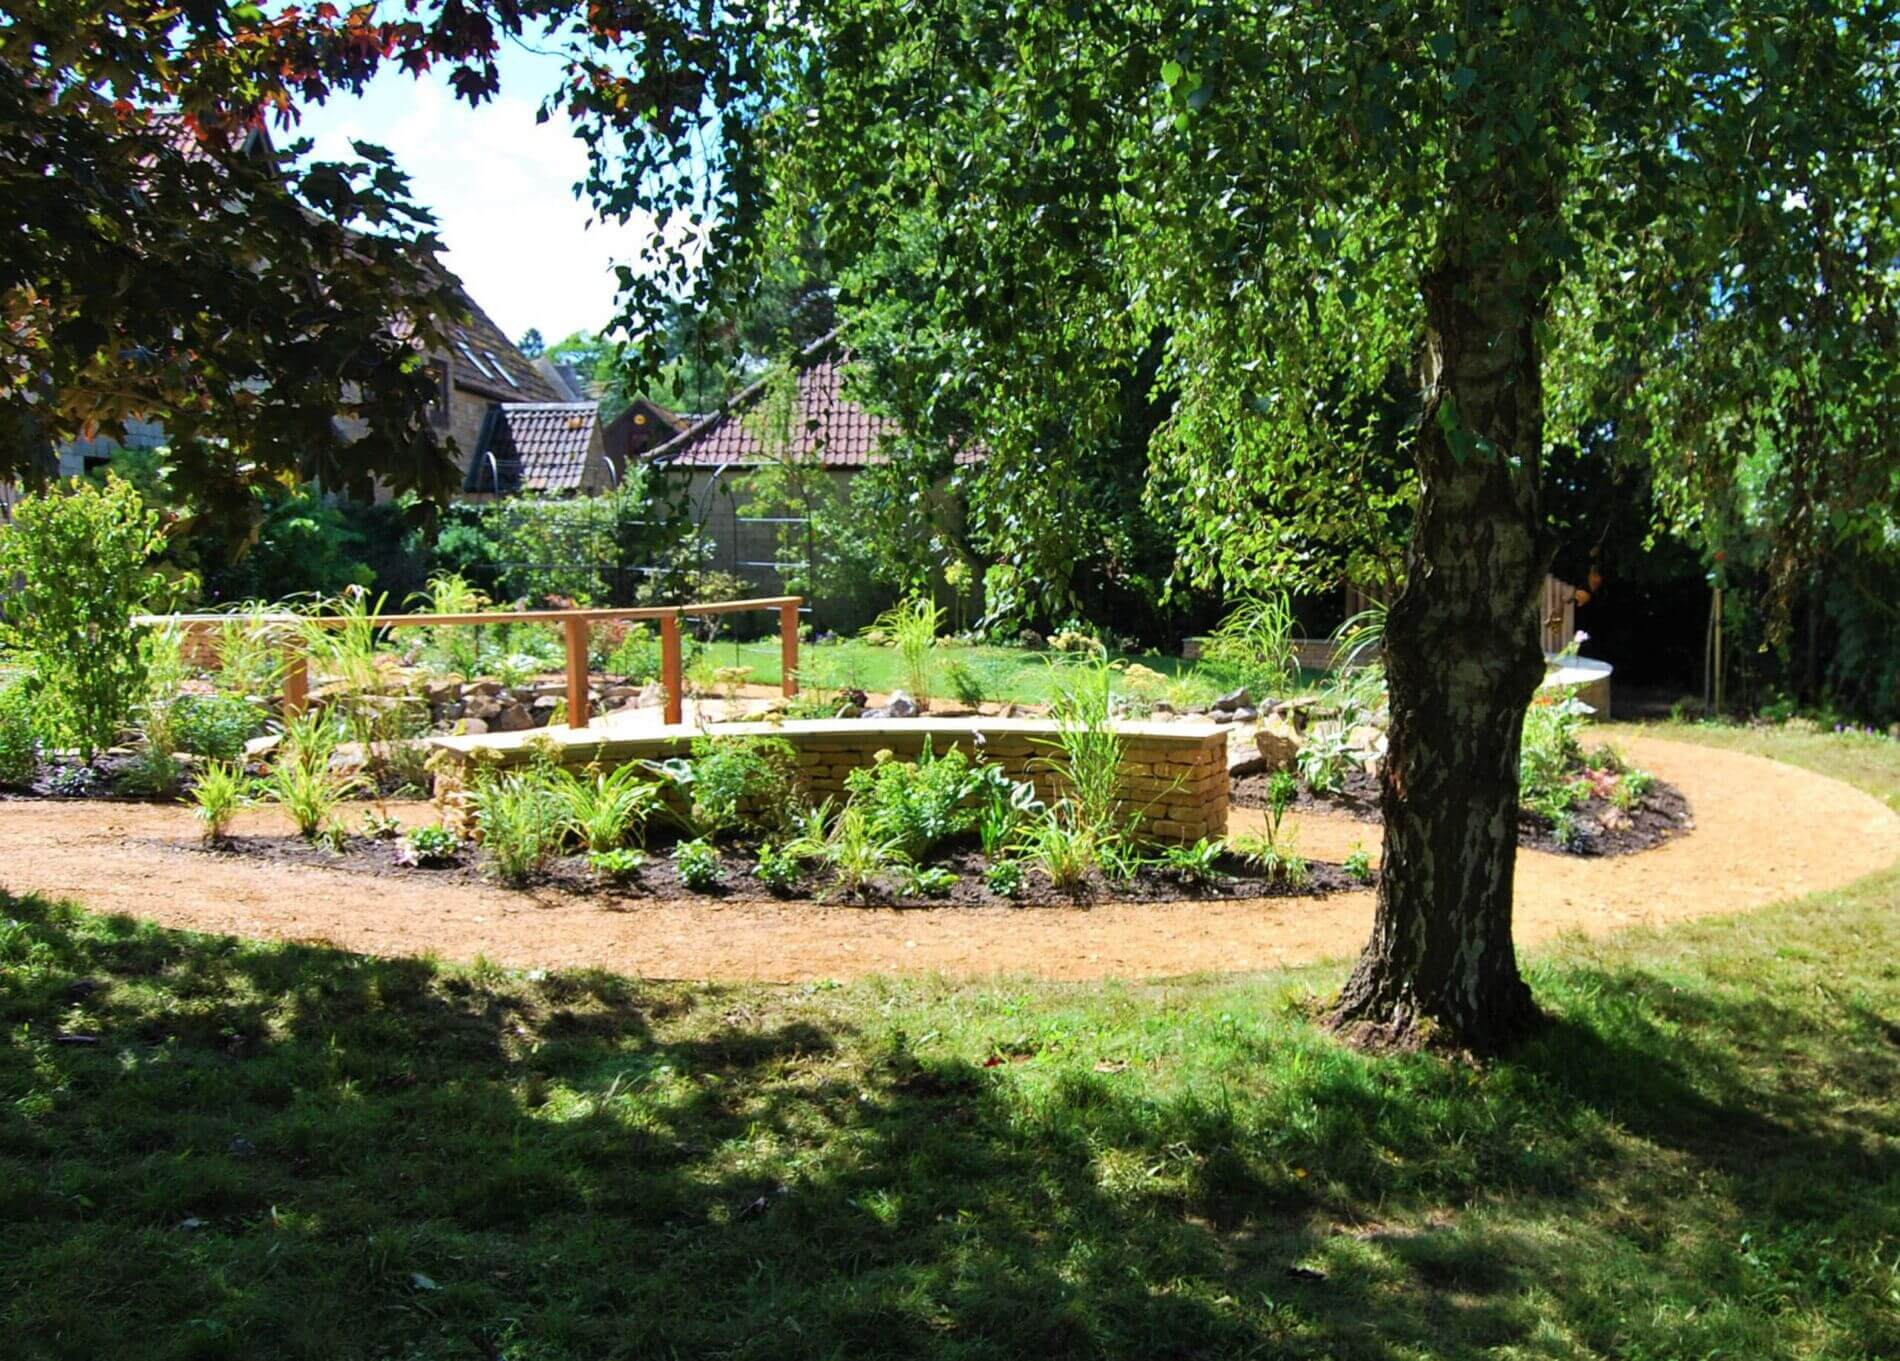 "<p style=""font-family:verdana"">Ashmead garden design</p>"